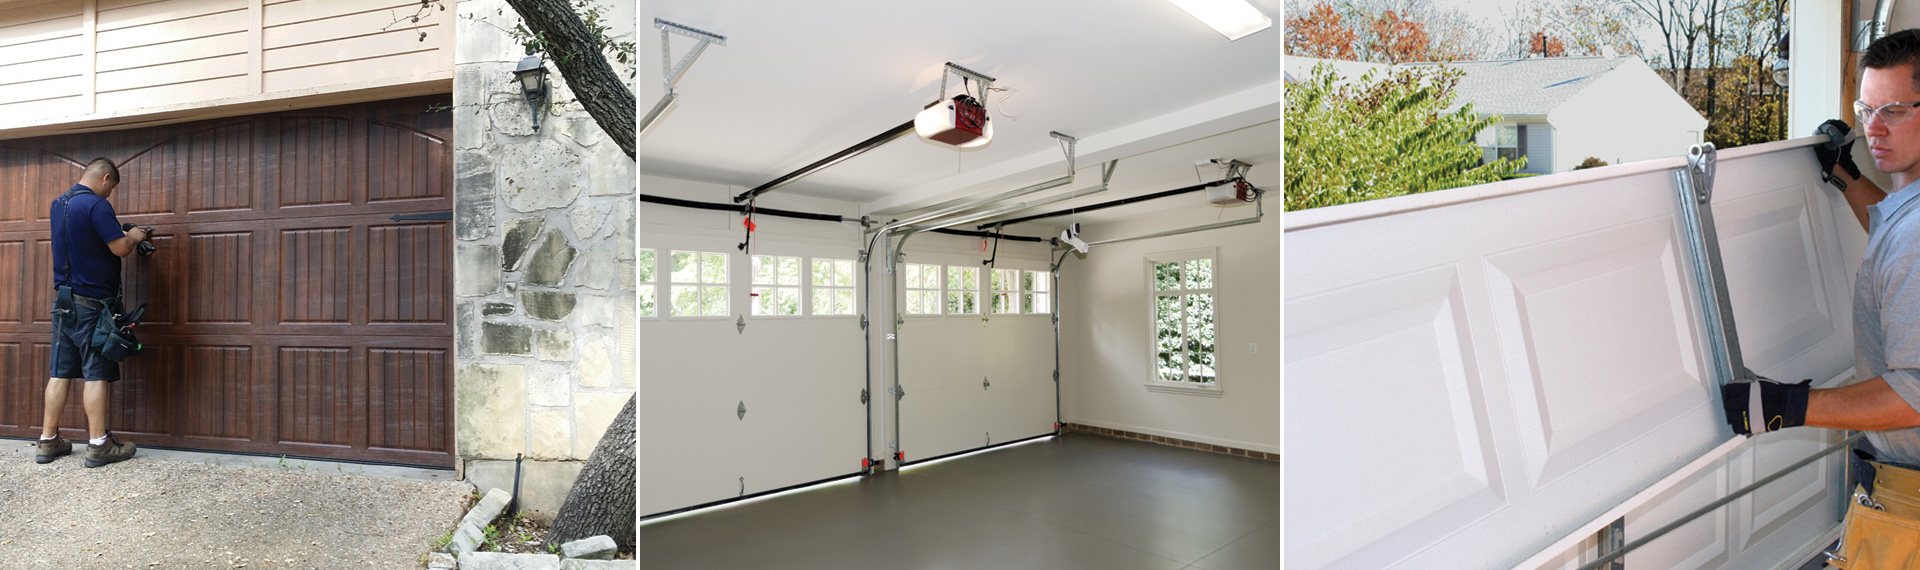 All Garage Door Services Havertown PA